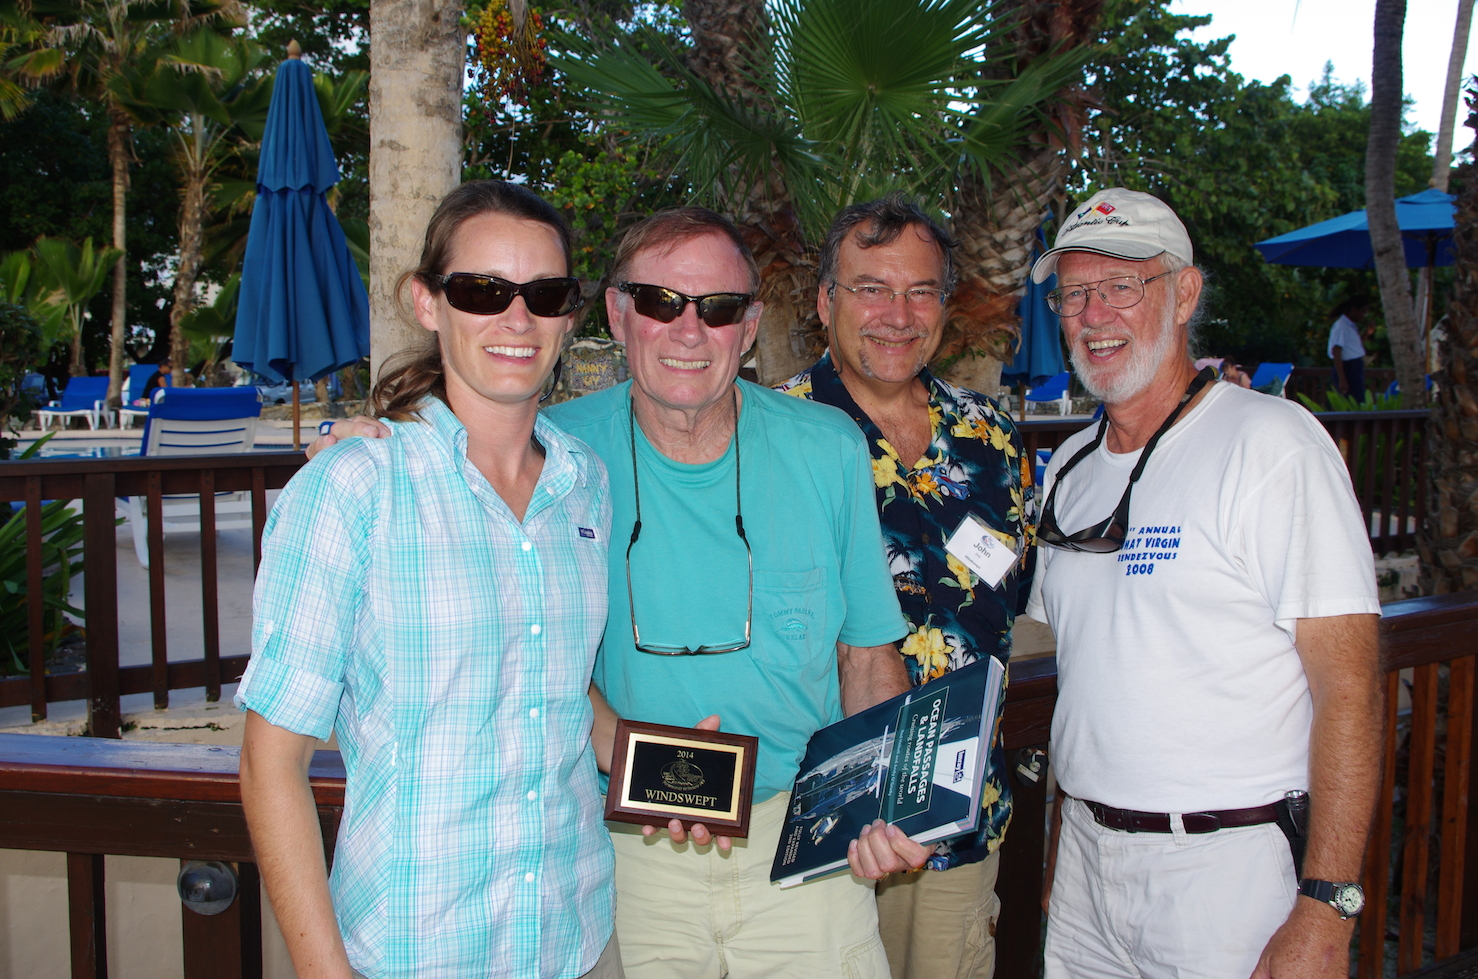 2014_C1500_Nanny Cay_Prizegiving_Terry Windswept_Endurance award.JPG